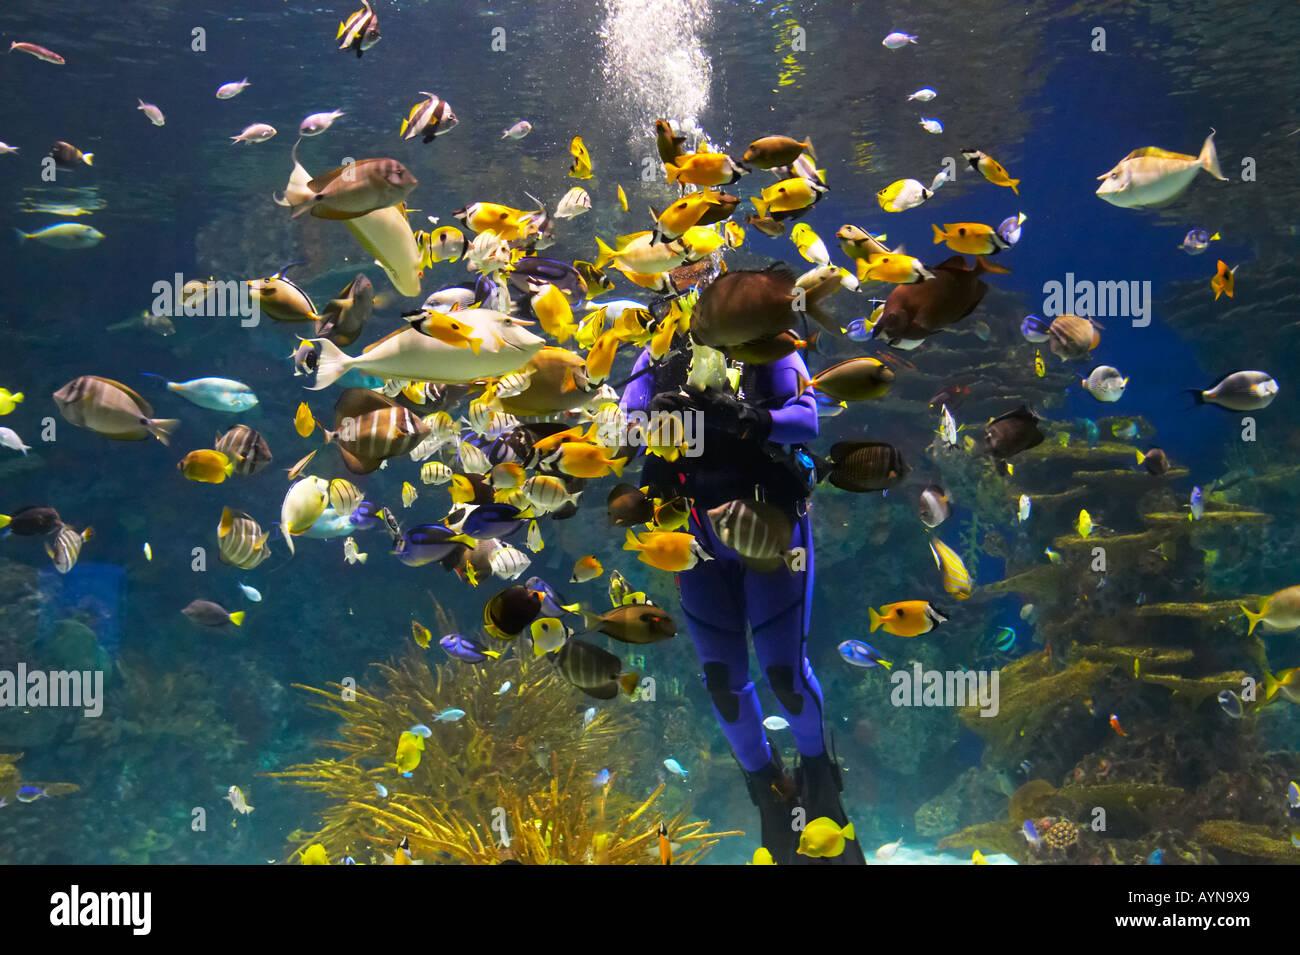 fish plenty of fishes aquarium sea tank ocean vivid feeding water